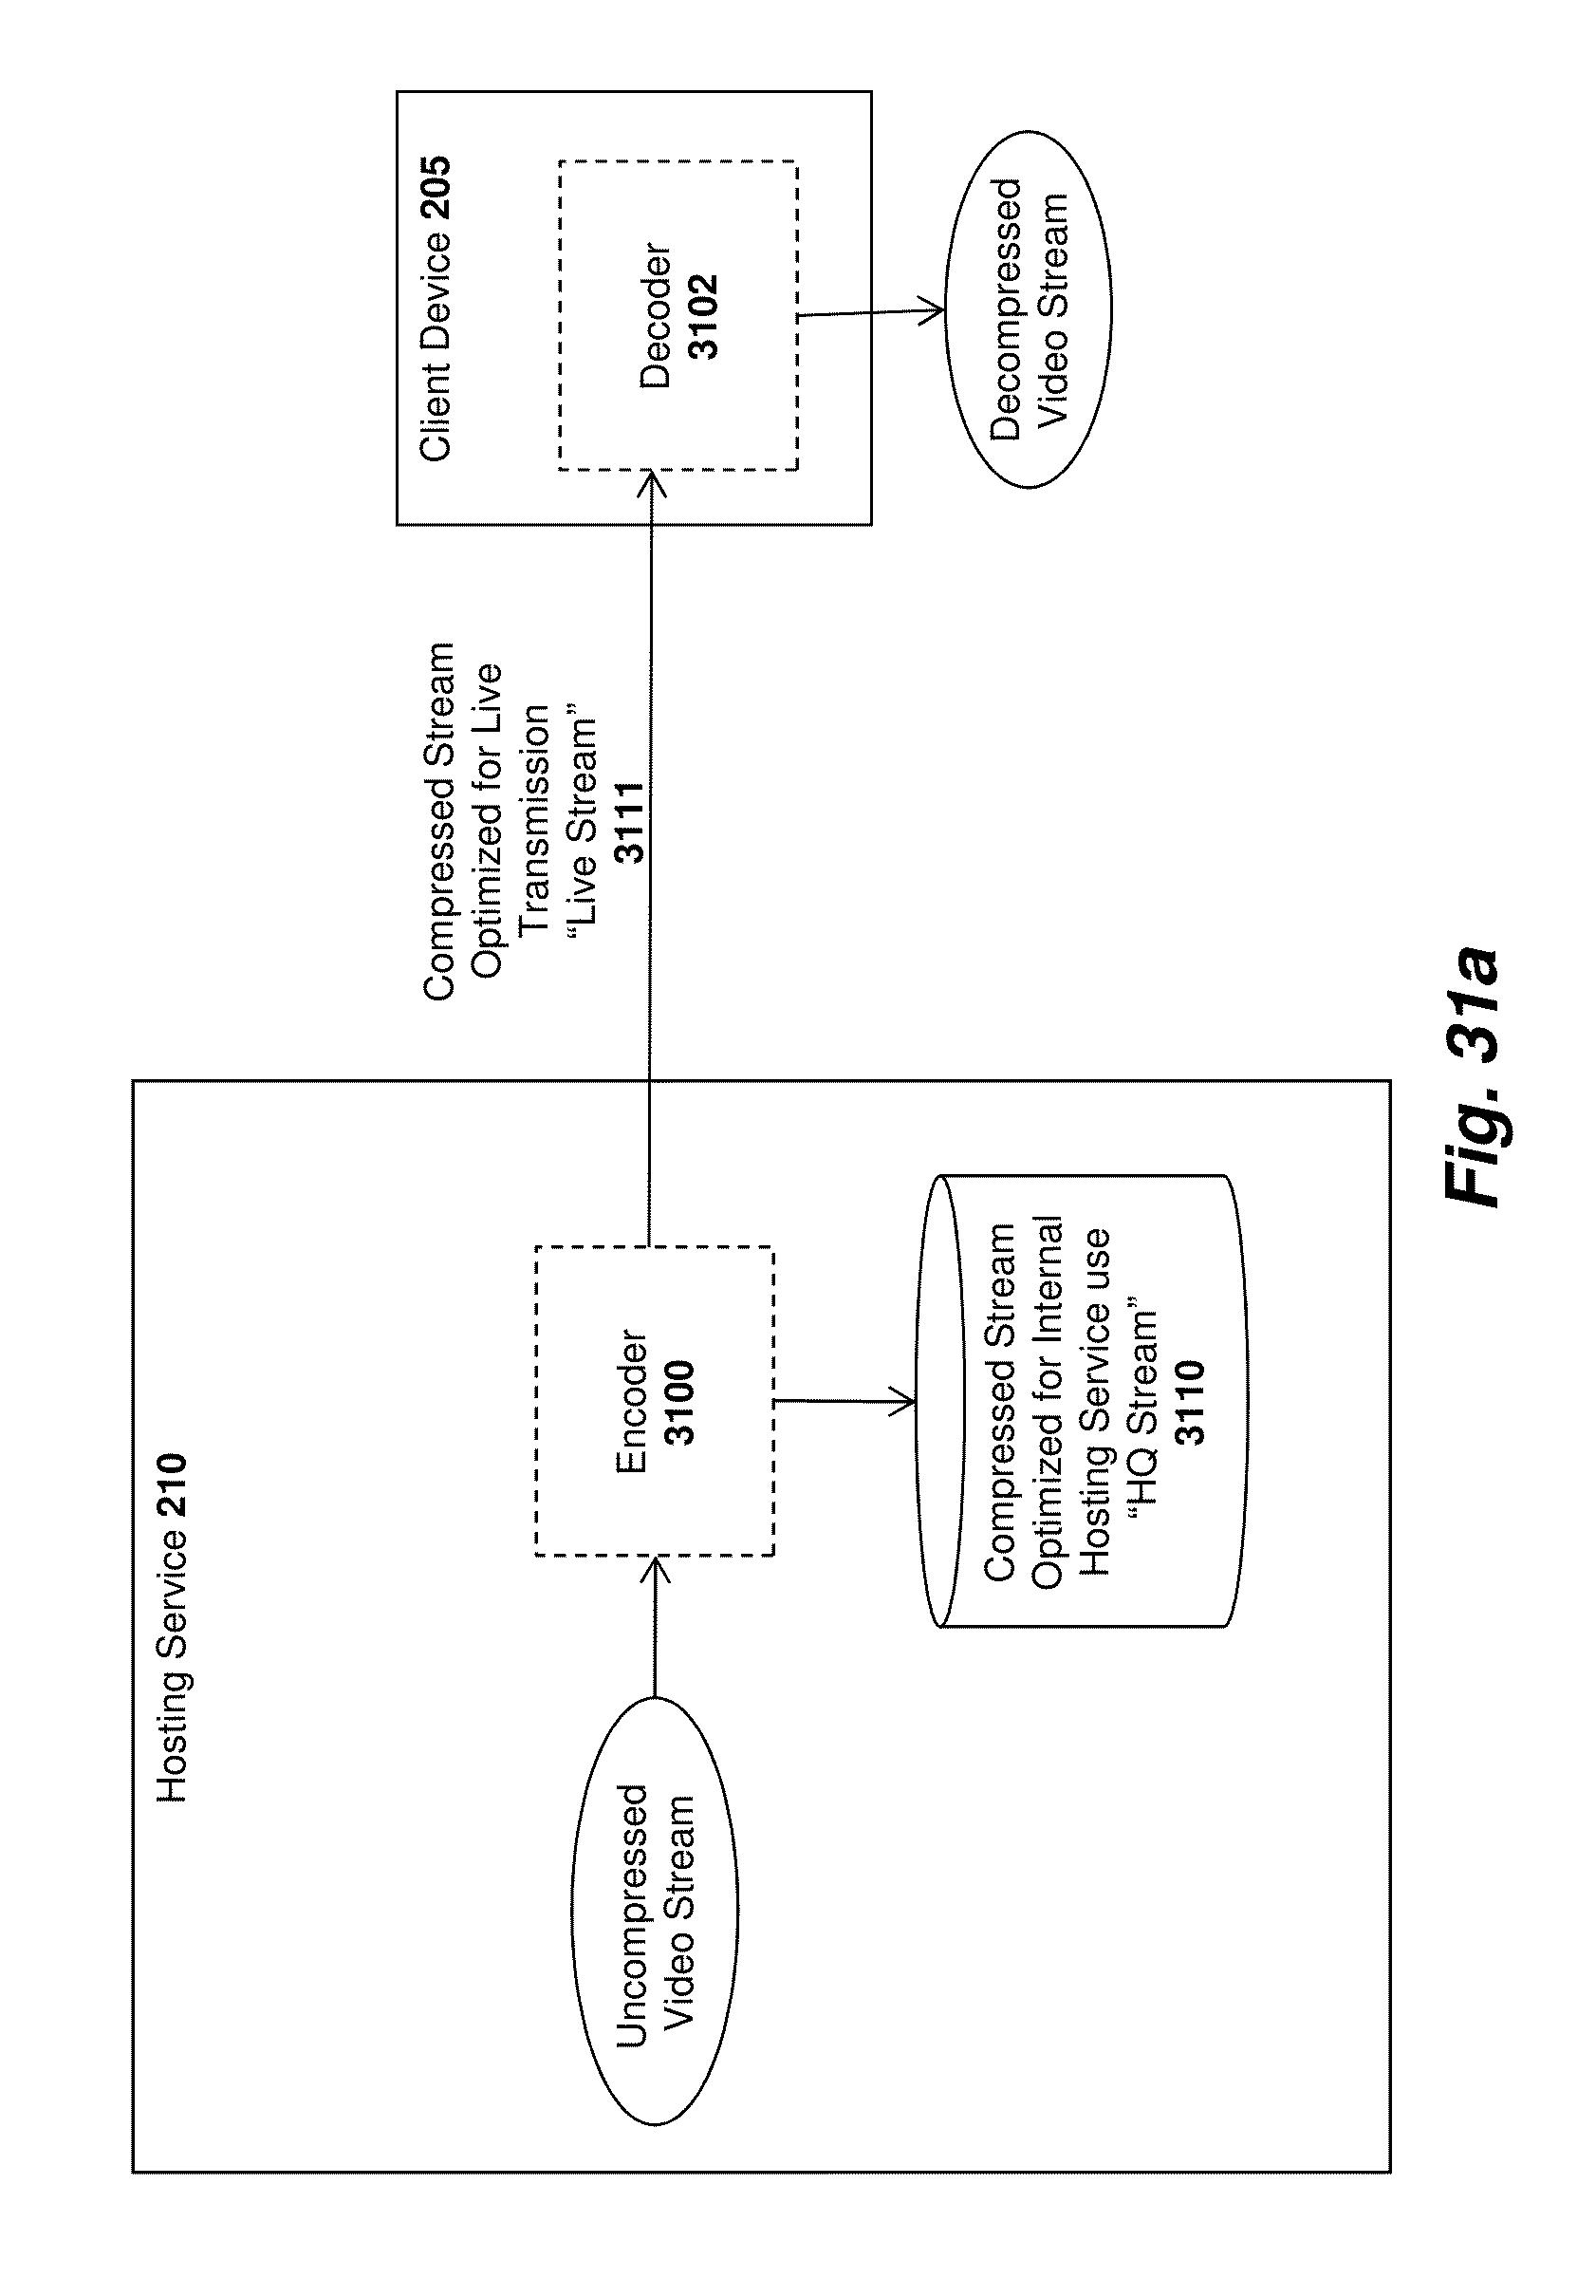 Patent US 9,420,283 B2